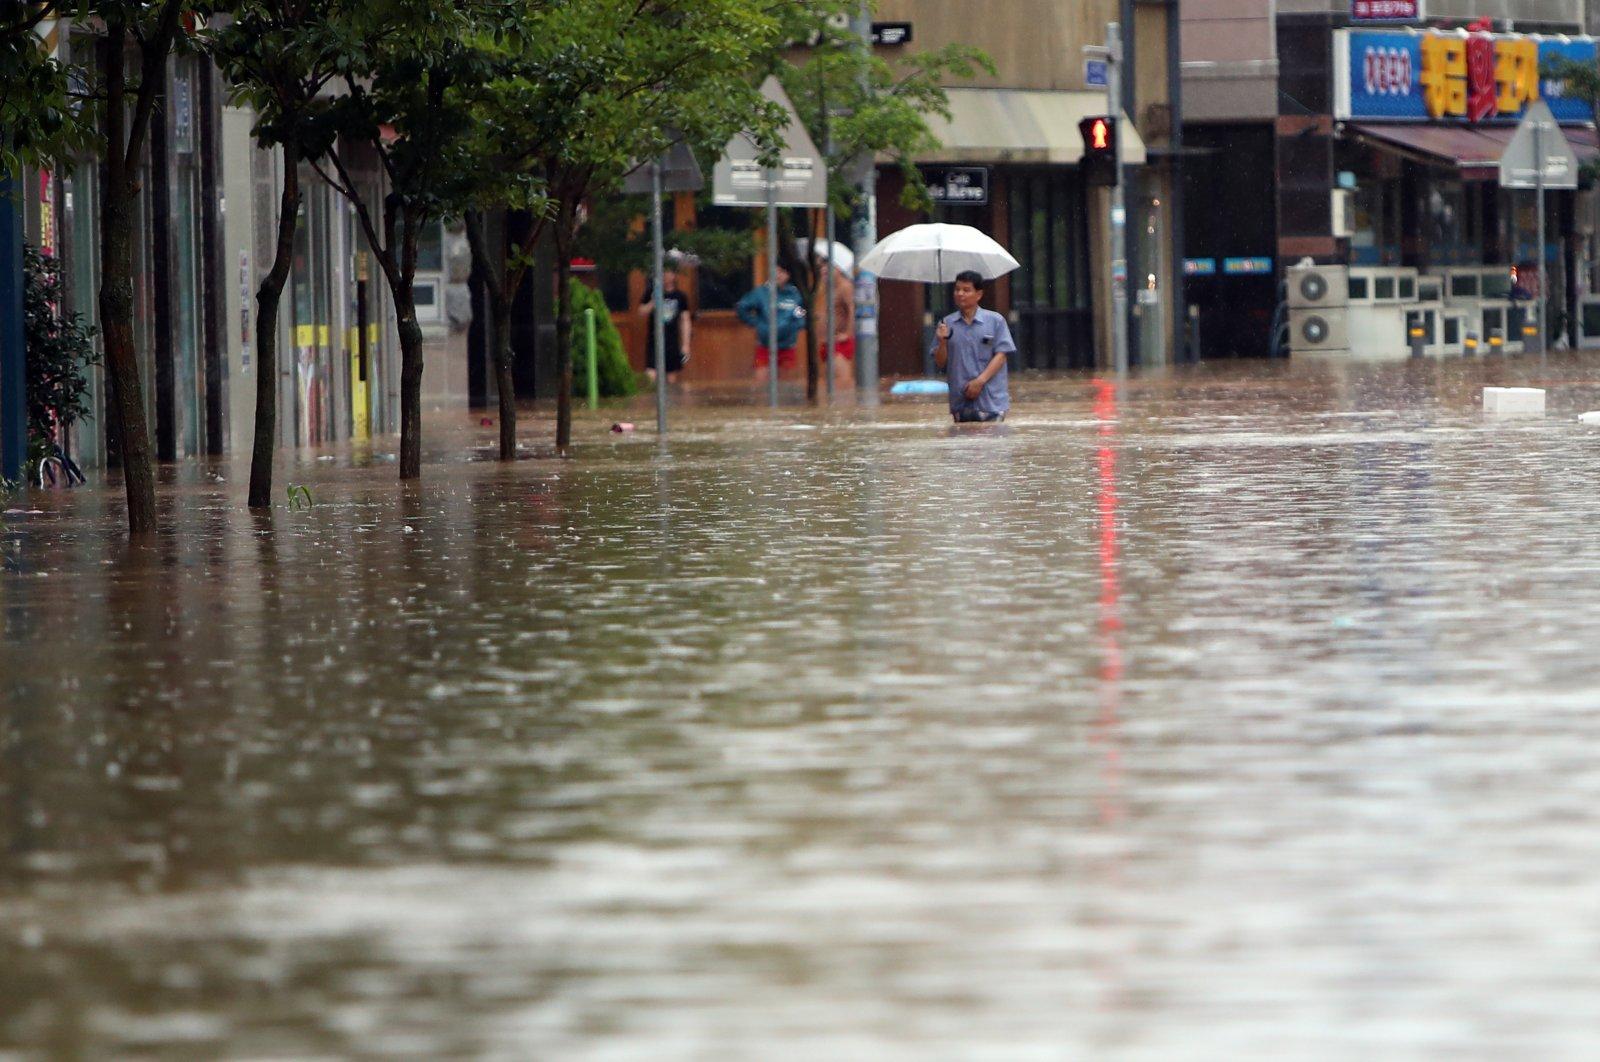 A resident wades through a flooded street amid heavy rain in Gwangju, South Korea, Aug. 8, 2020. (EPA Photo)